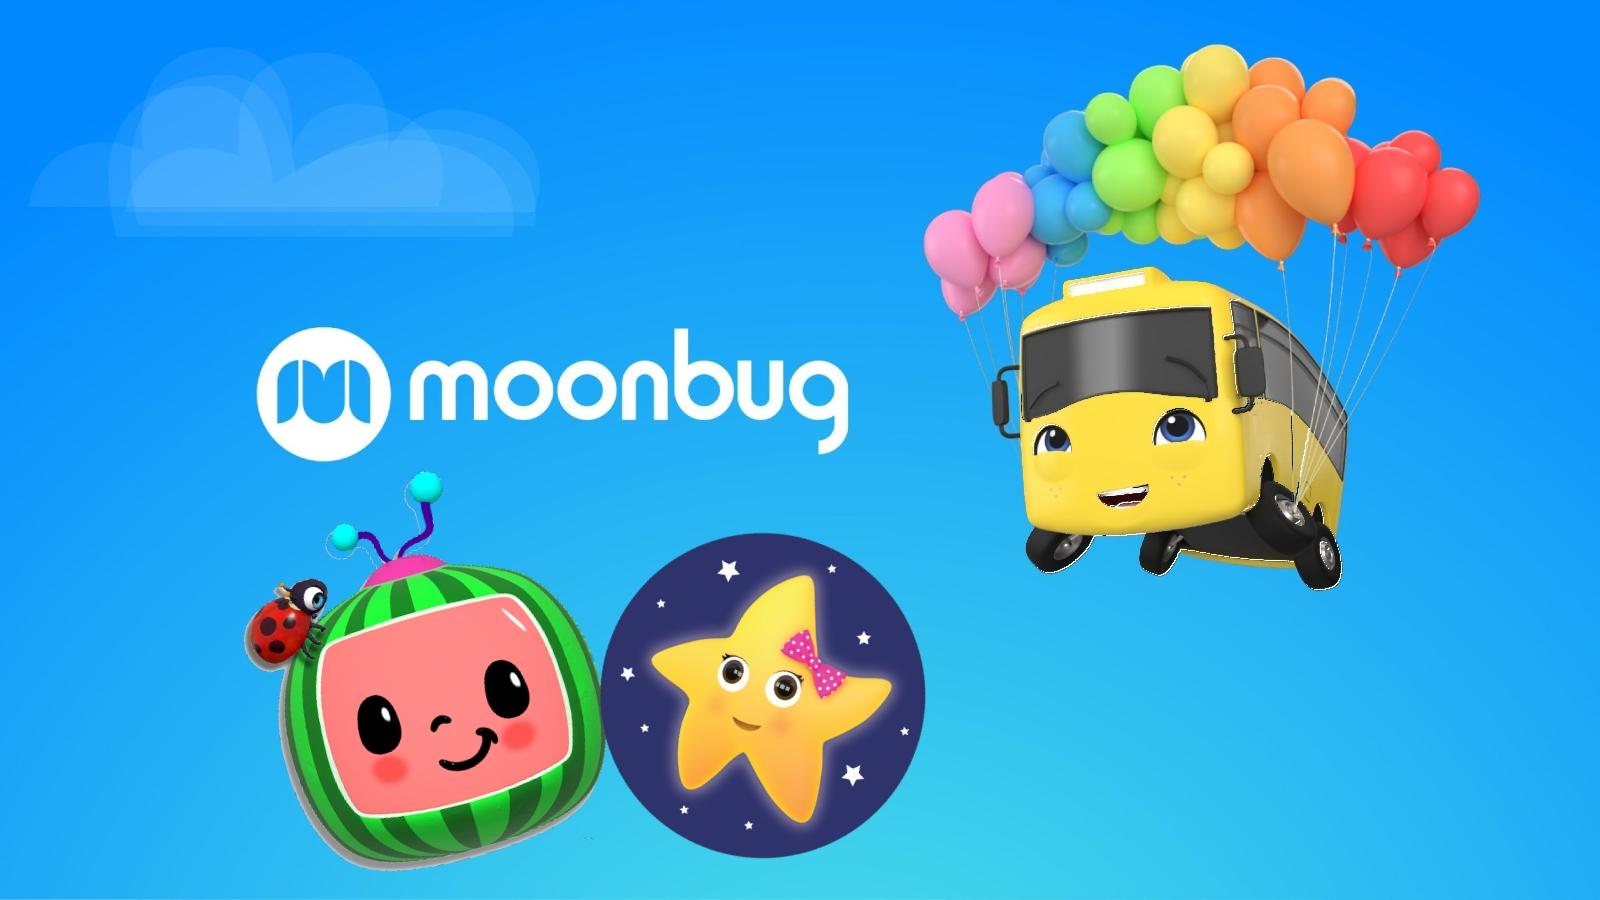 moonbug entertainment youtube channels cocomelon little baby bum